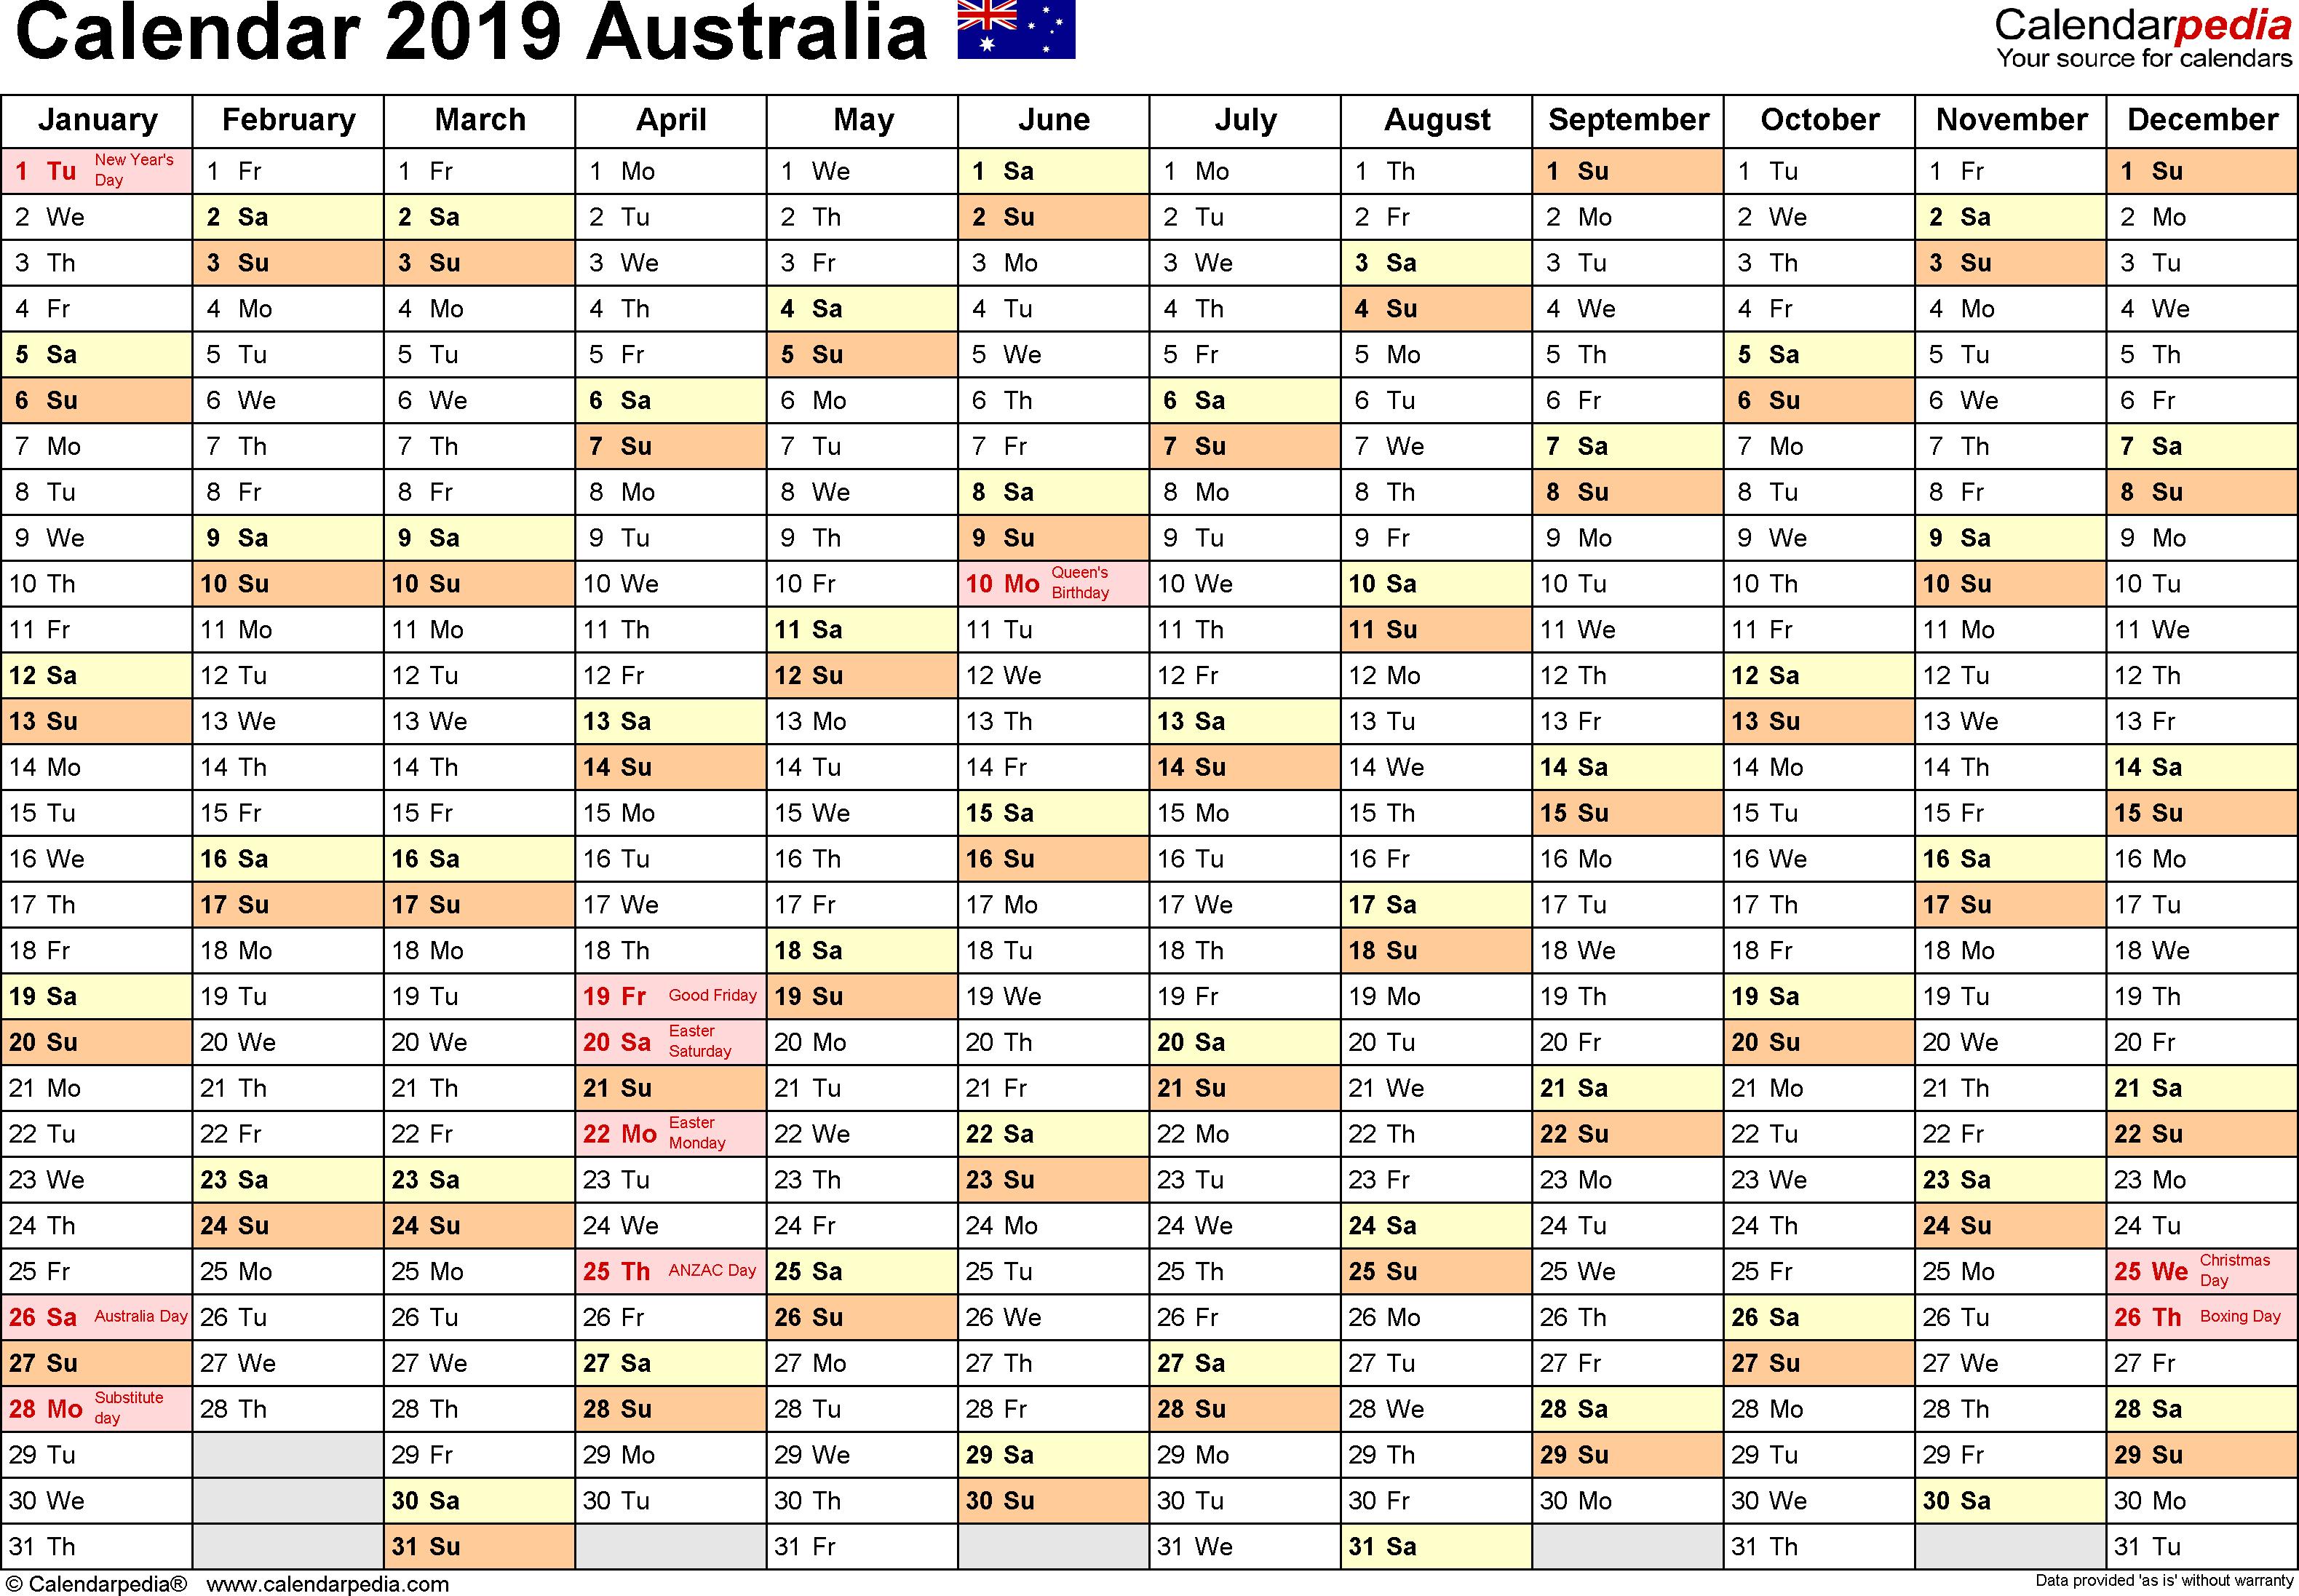 Australia Calendar 2019 - Free Printable Excel Templates